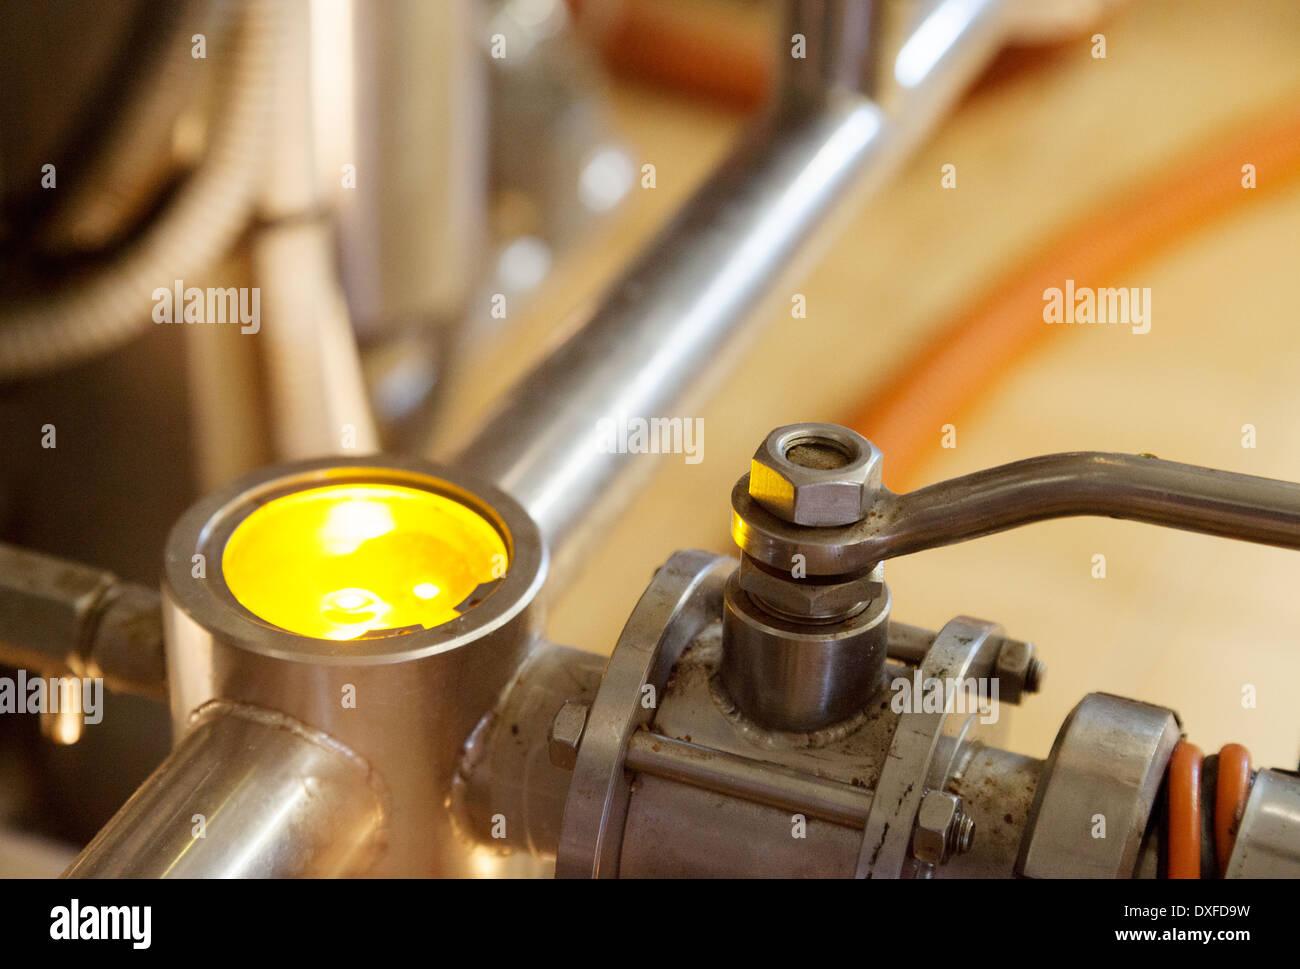 Factory machines machinery close up - Stock Image